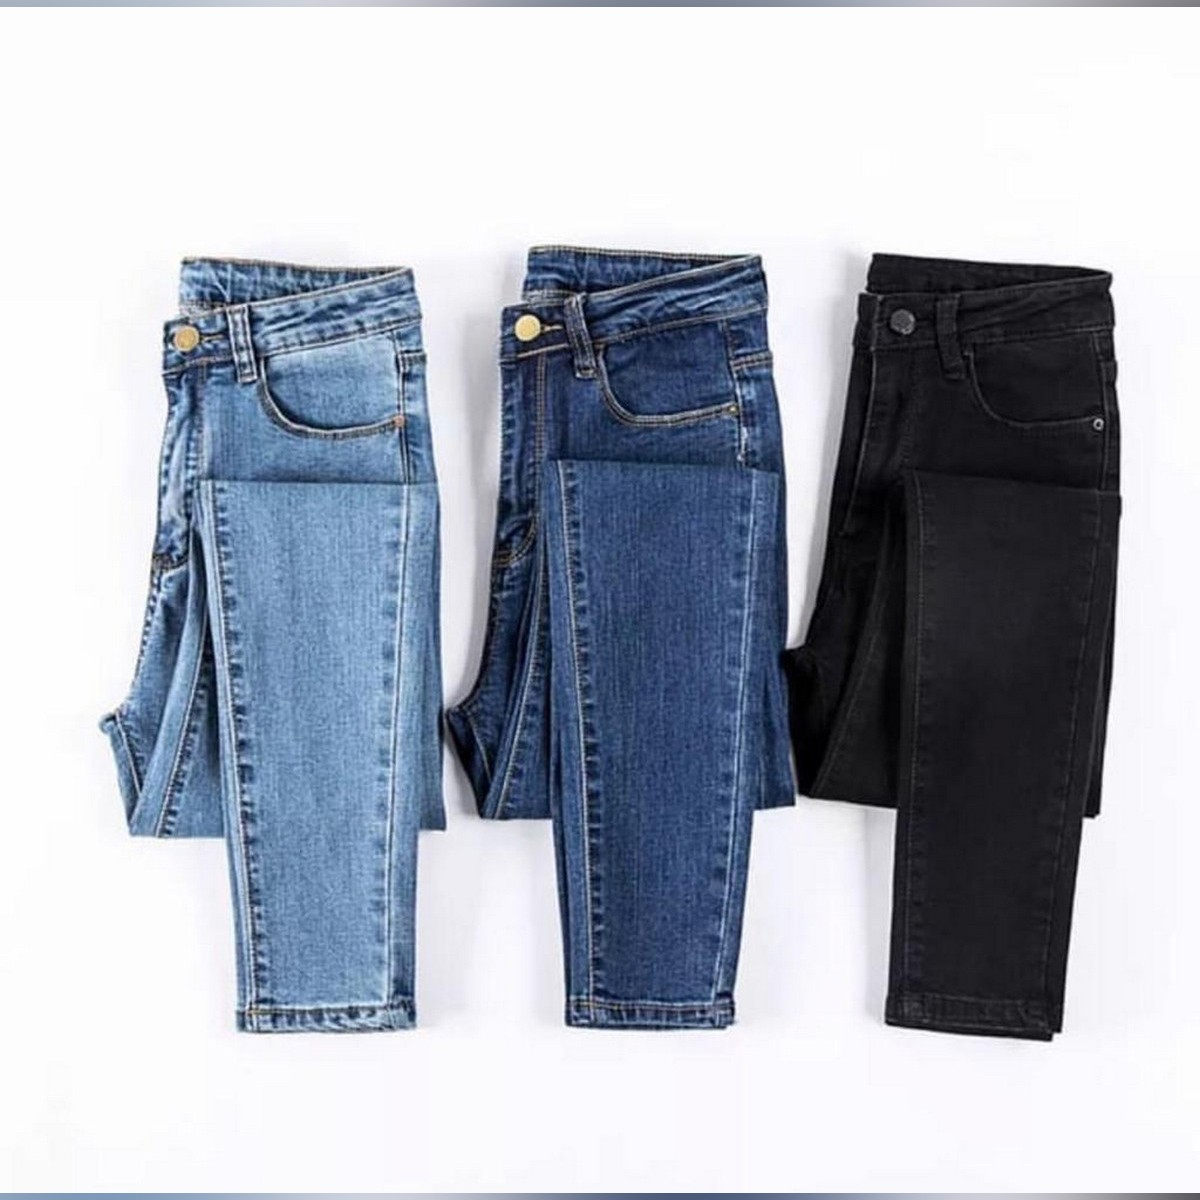 PENTS-Fashion,Hot,Ladies Denim Pants Stretch Womens Ripped Skinny High Waist Jeans Denim (EXPORT DENIM)